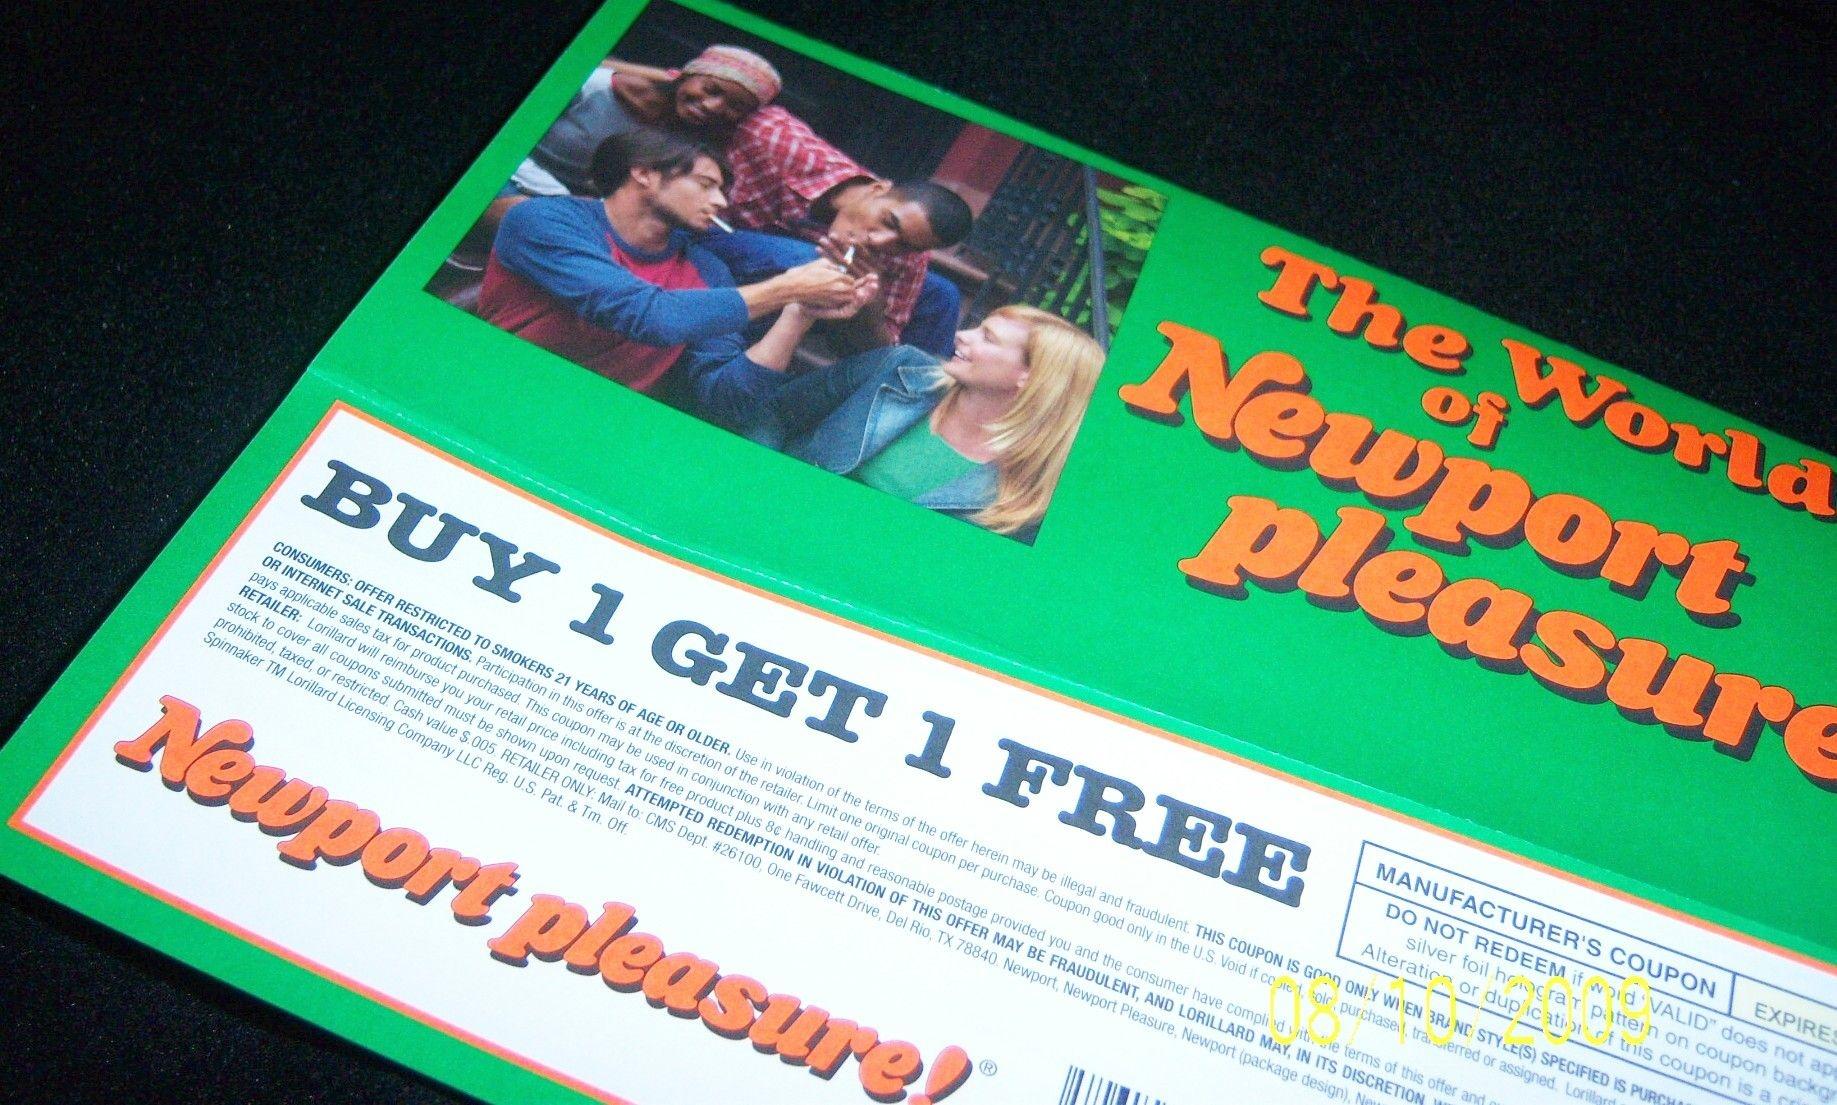 Pindebi On Coupons | Newport Cigarettes, Cigarette Coupons Free - Free Printable Newport Cigarette Coupons